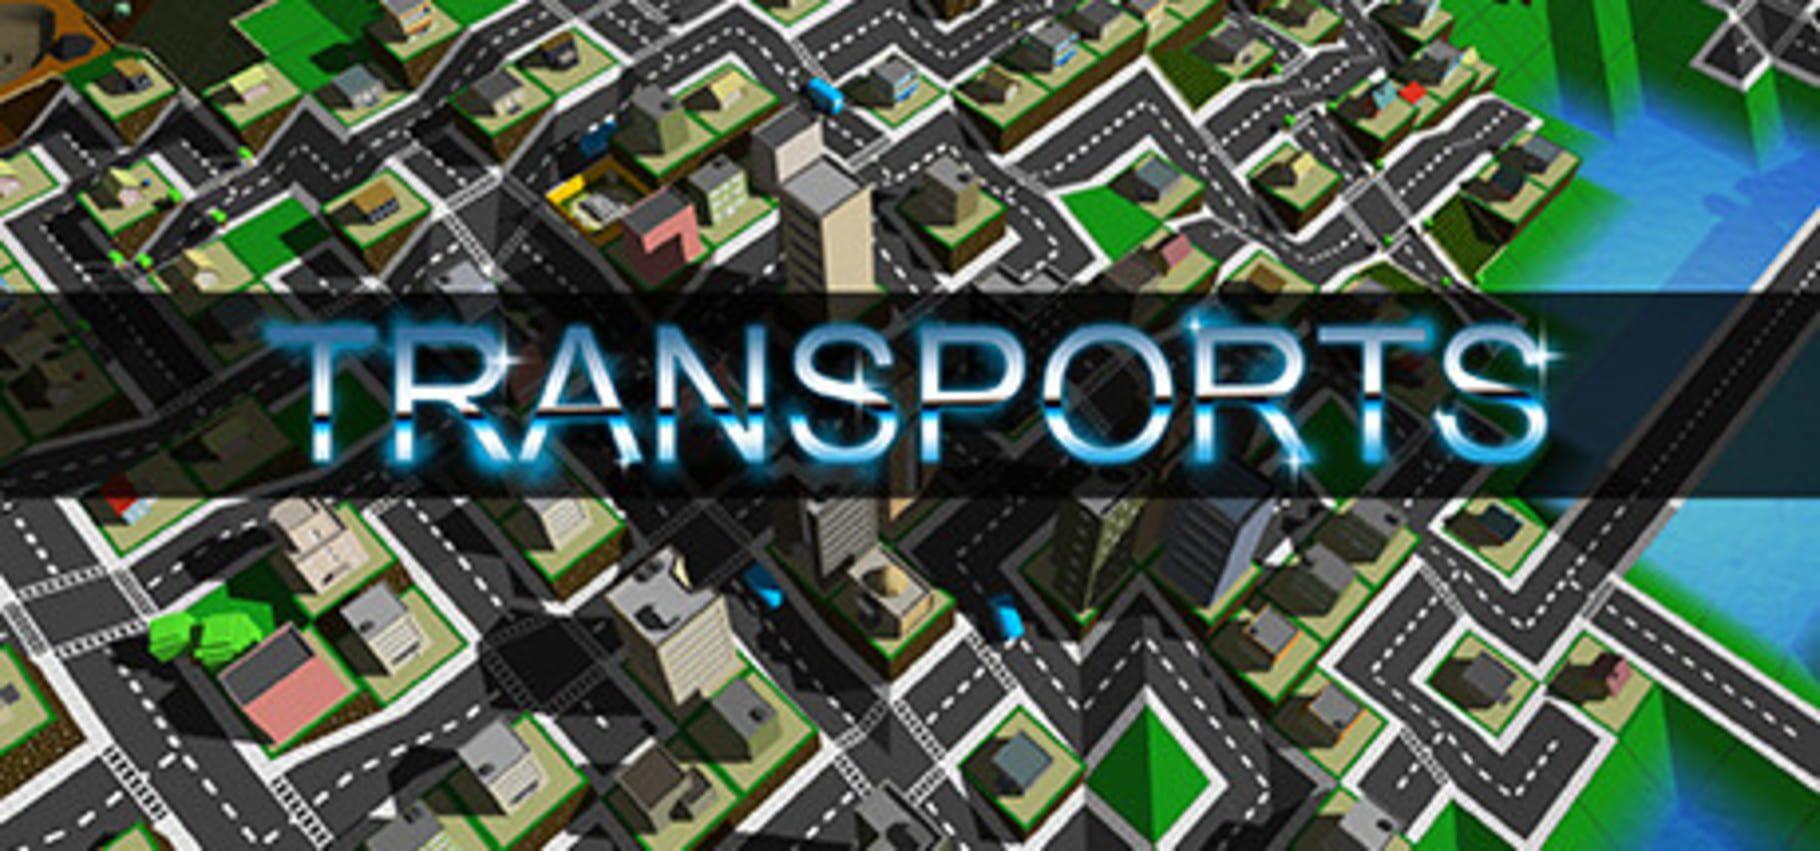 buy Transports cd key for all platform